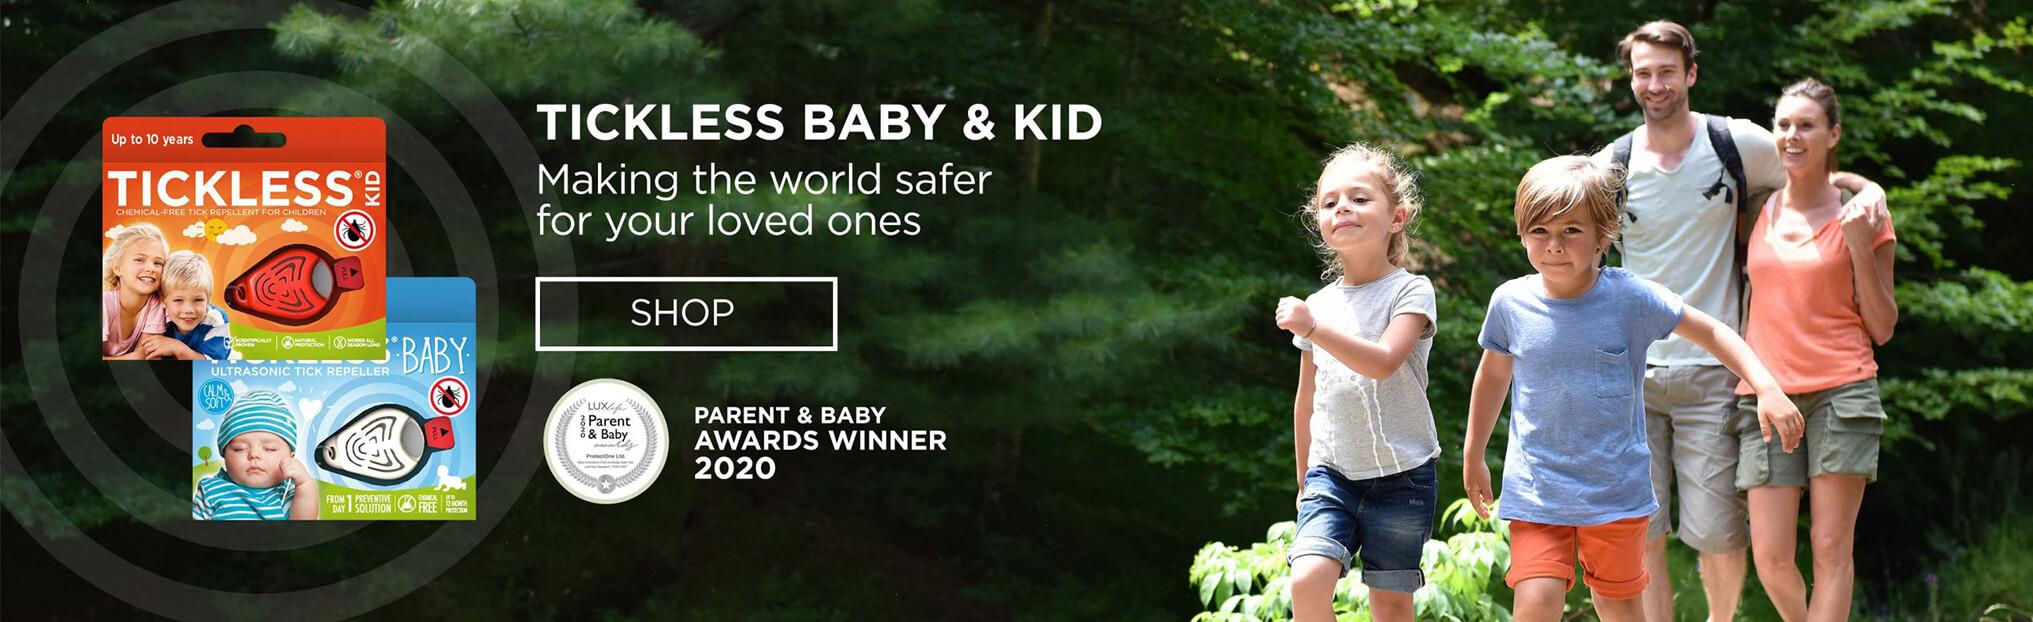 EN-Baby-Kid-lux-díj-slider2020_4066x1244px-scaled